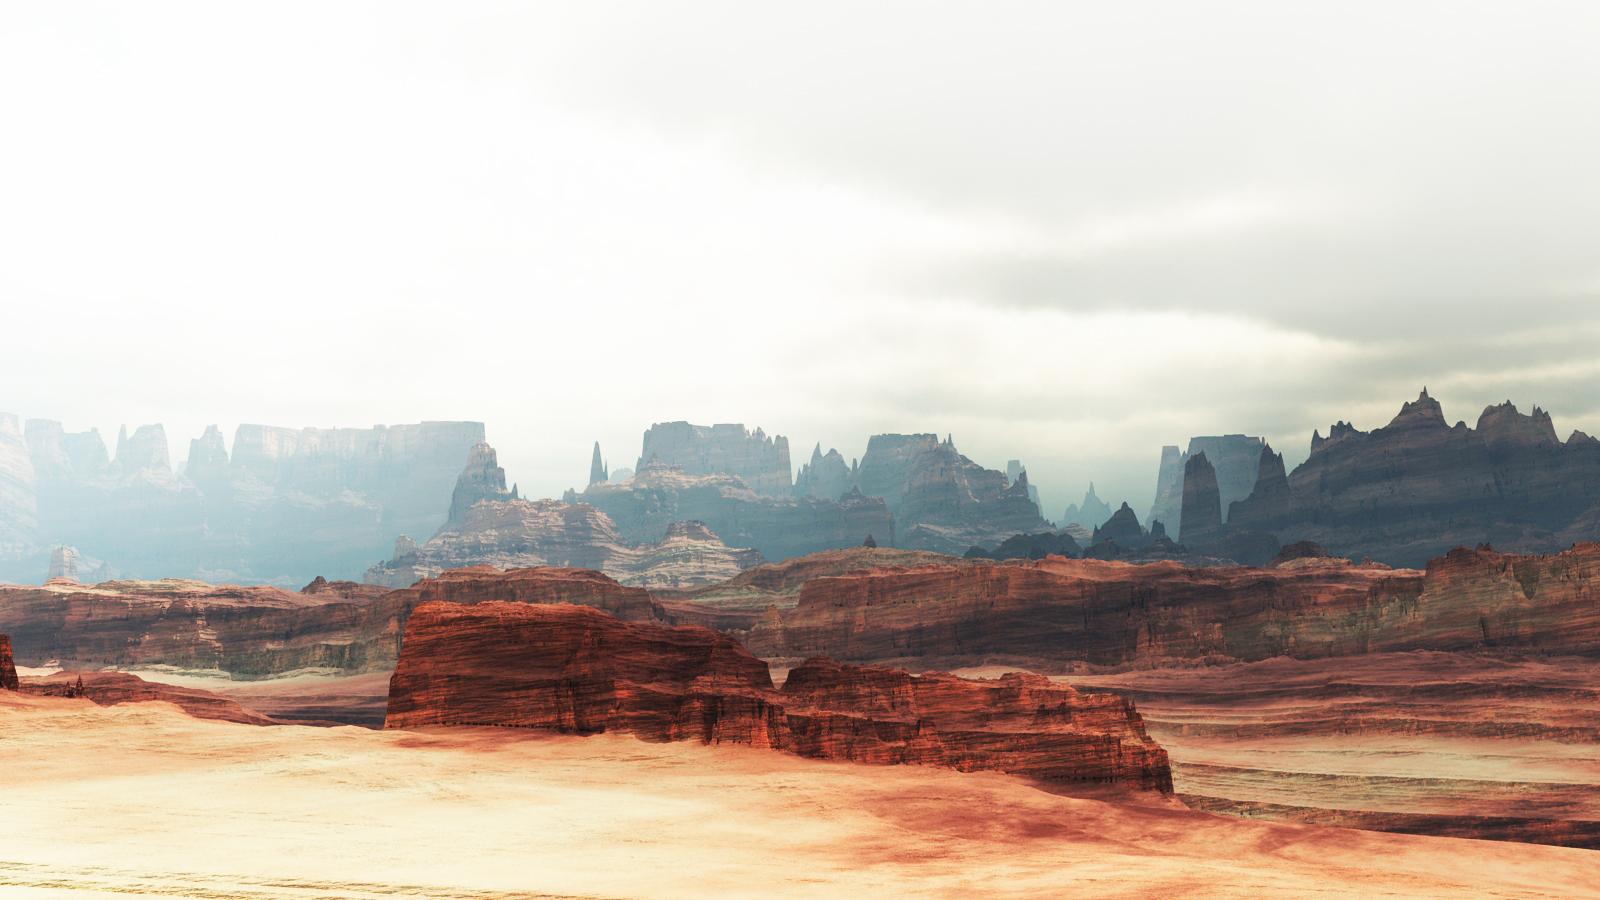 Mars by Hythamkalefe